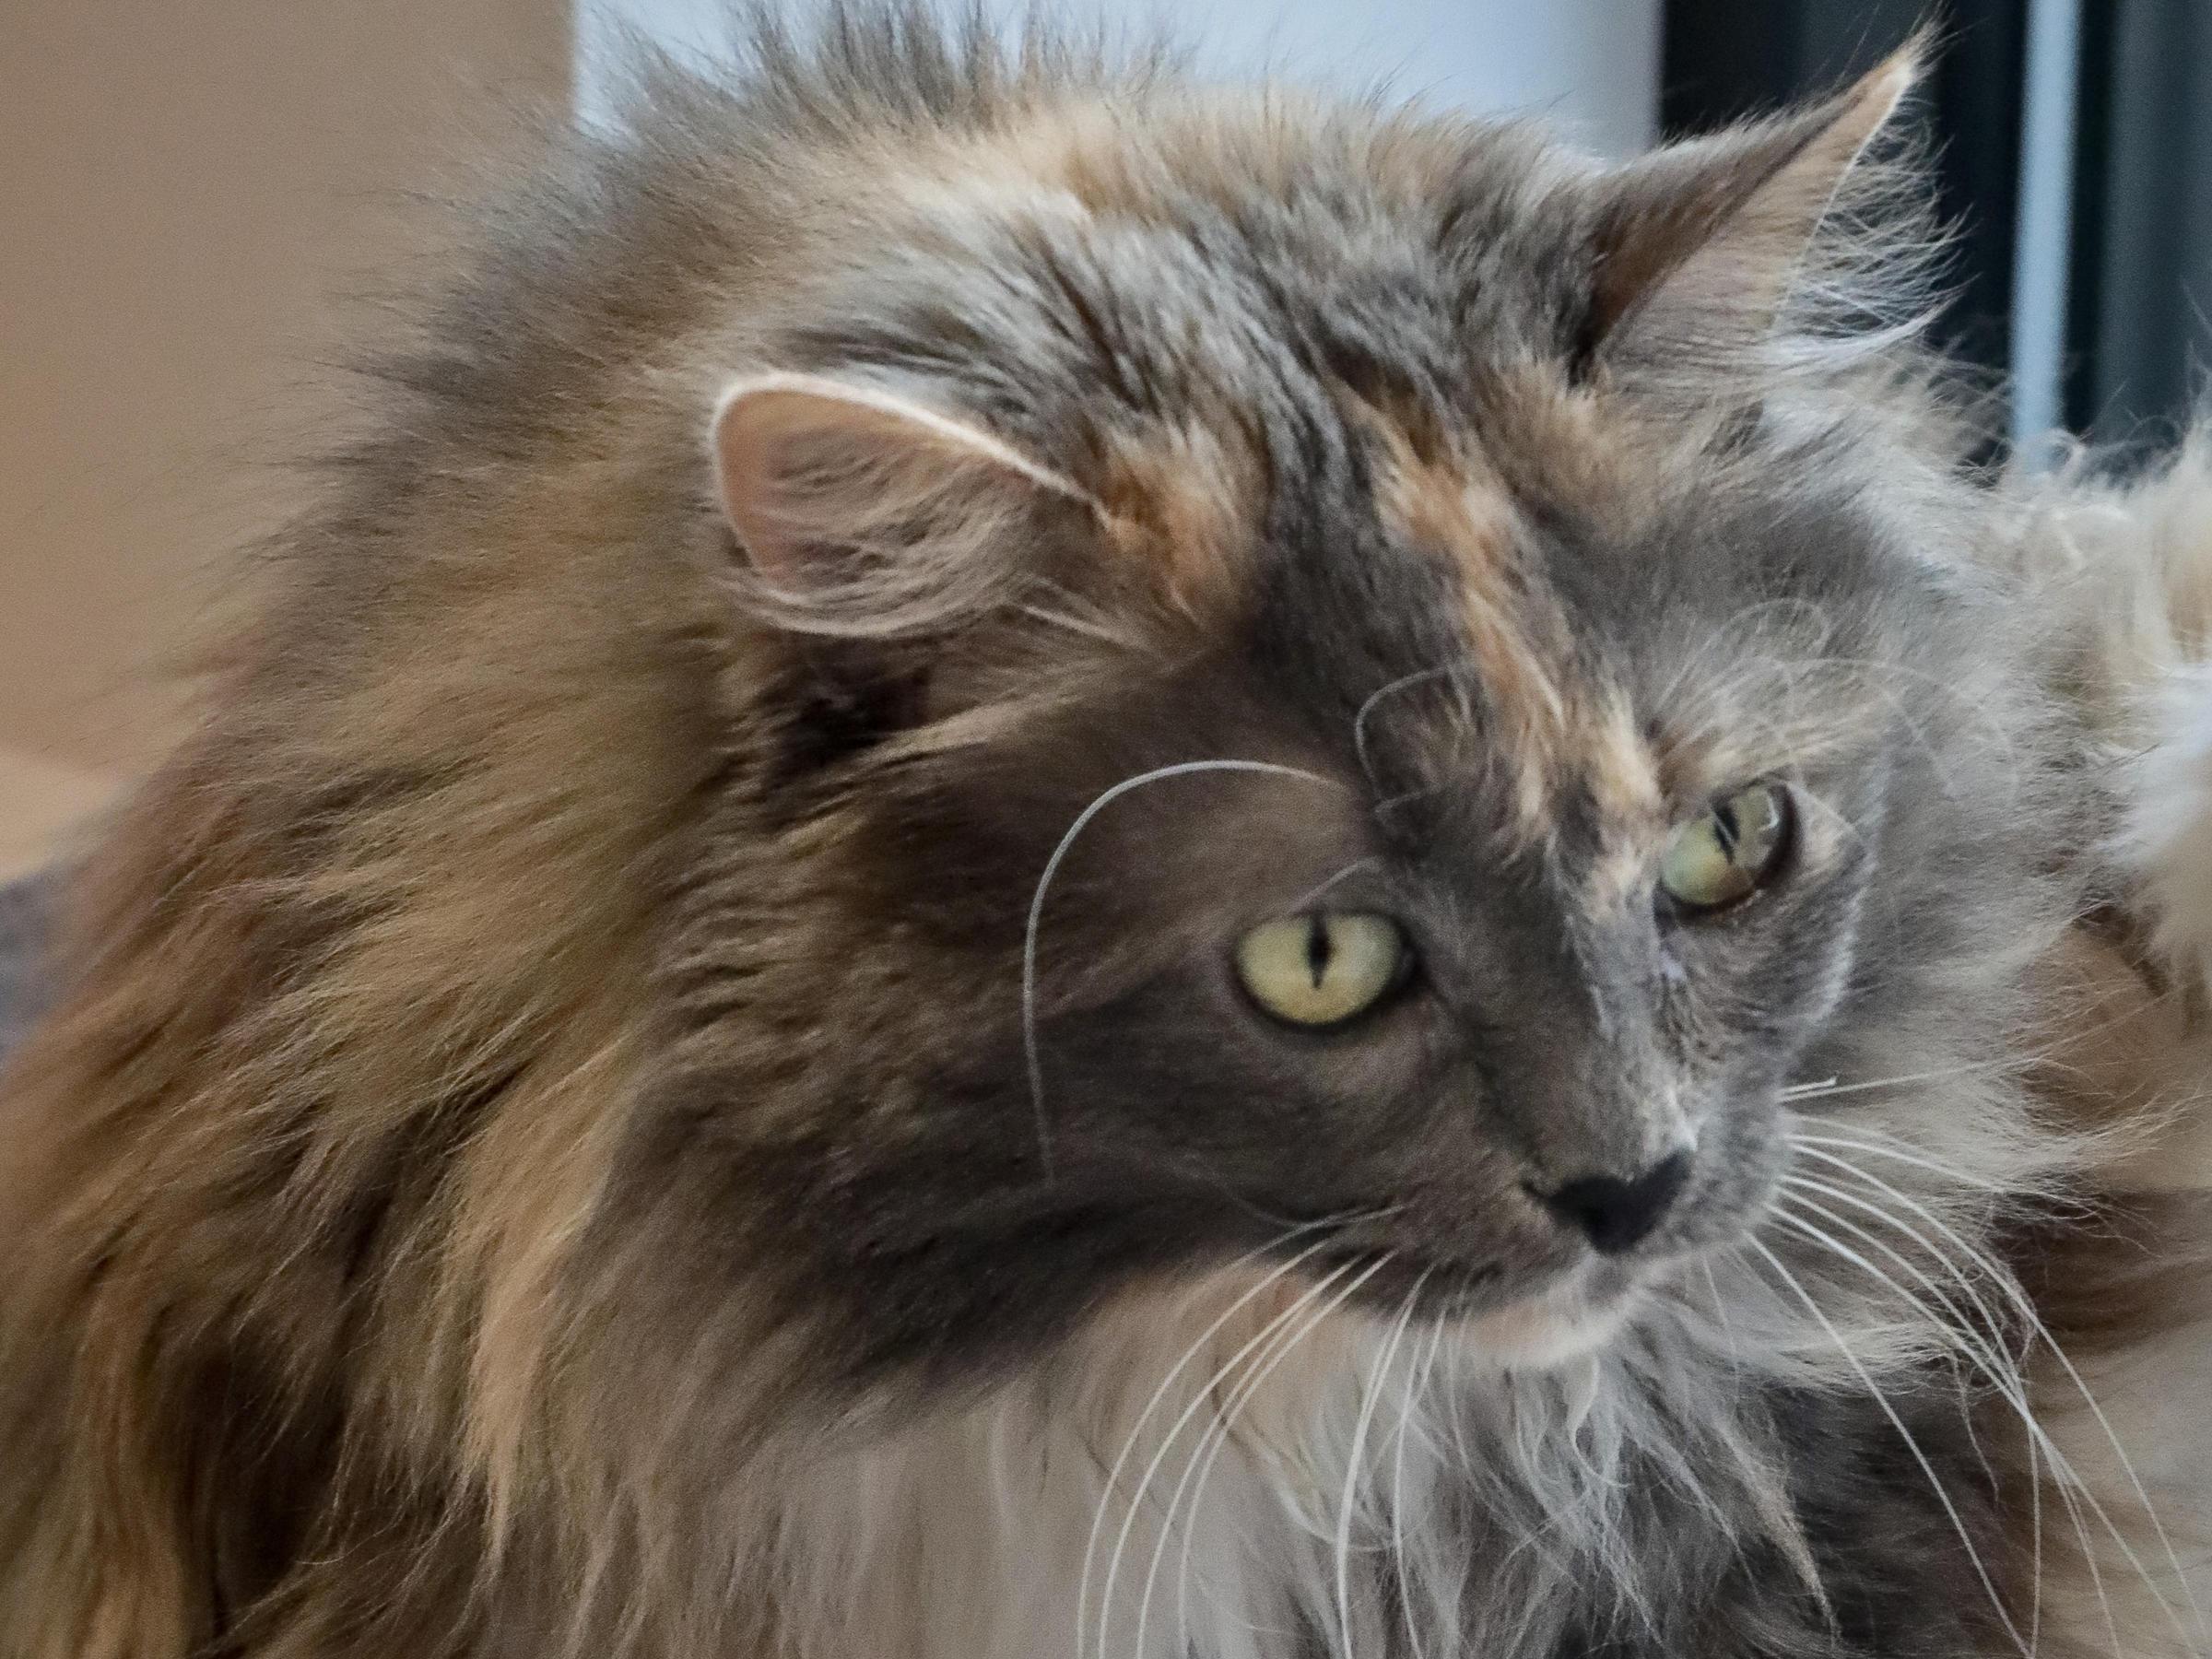 Cats Can Keep Their Claws New York Bans Declawing South Carolina Public Radio